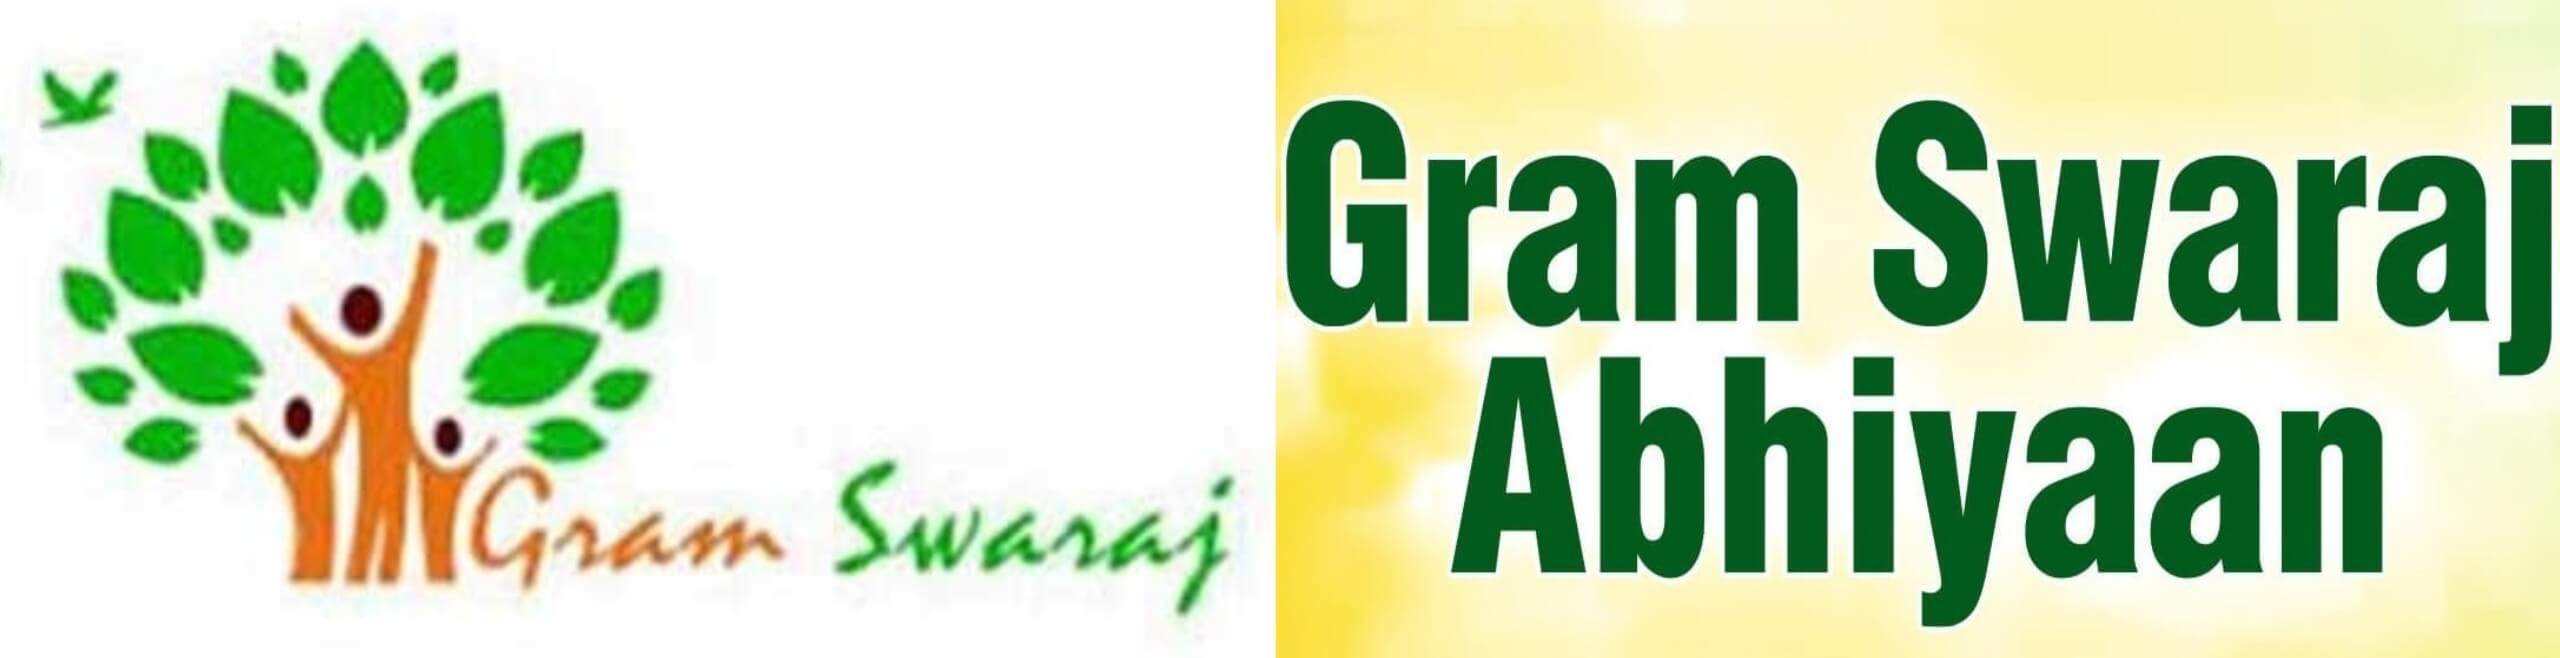 Soon Gram Swaraj Abhiyan in all villages: DC Hailakandi